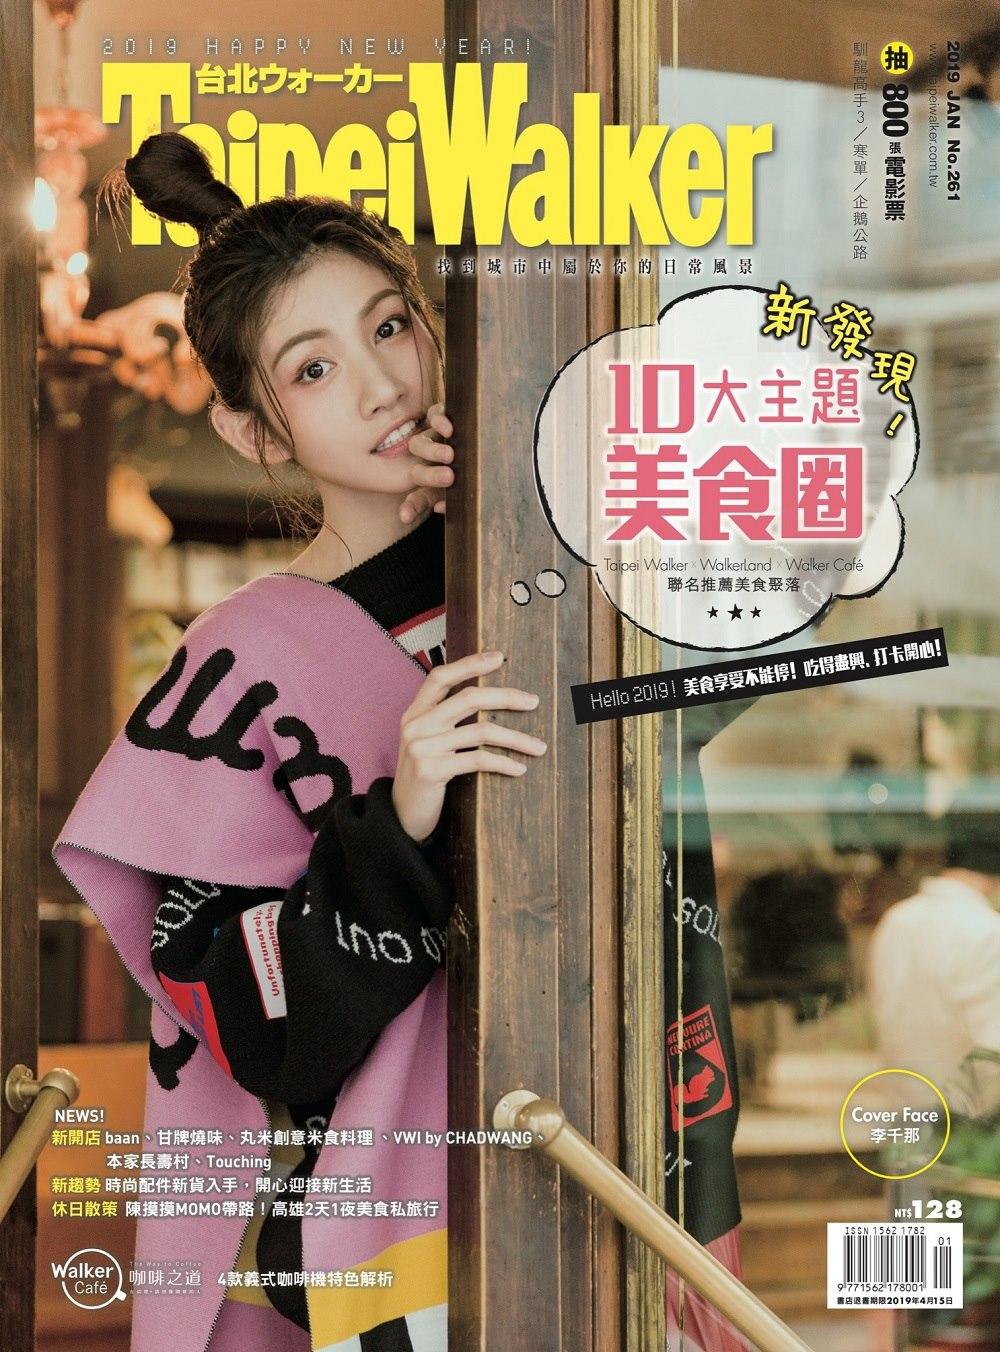 Taipei Walker 1月號/2019 第261期 贈:iphone 7+/8+ 通用玻璃保護貼